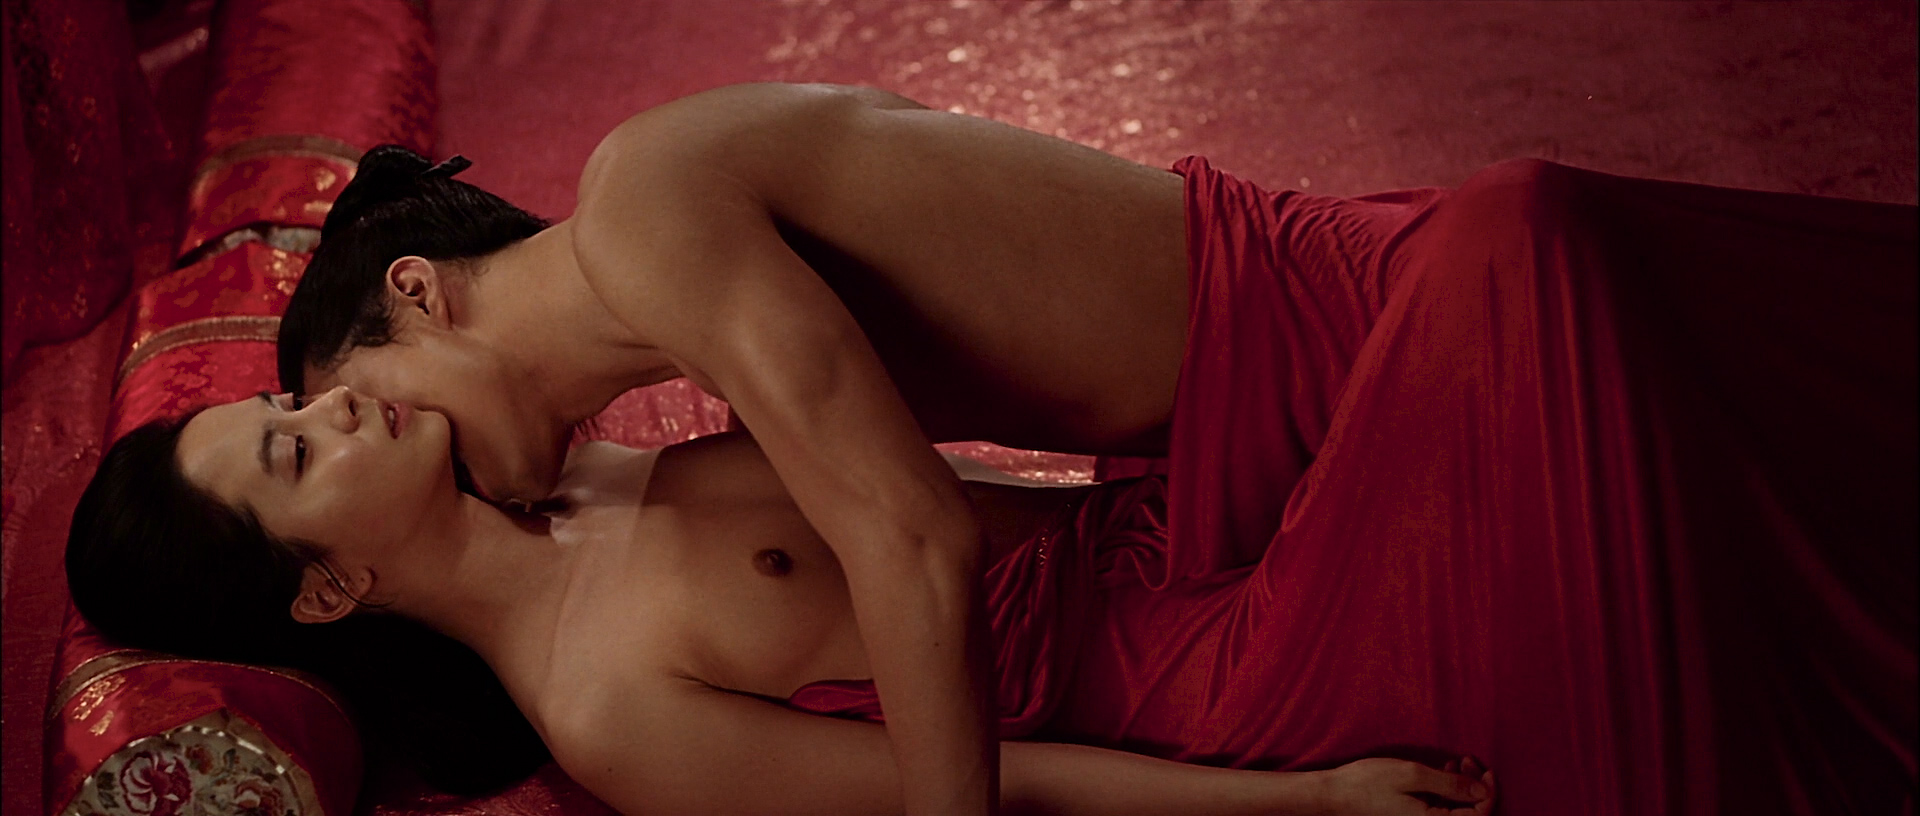 Ji-hyo Song nude topless butt and lot of hot sex - A Frozen Flower (KR-2008) HD 1080p BluRay (12)